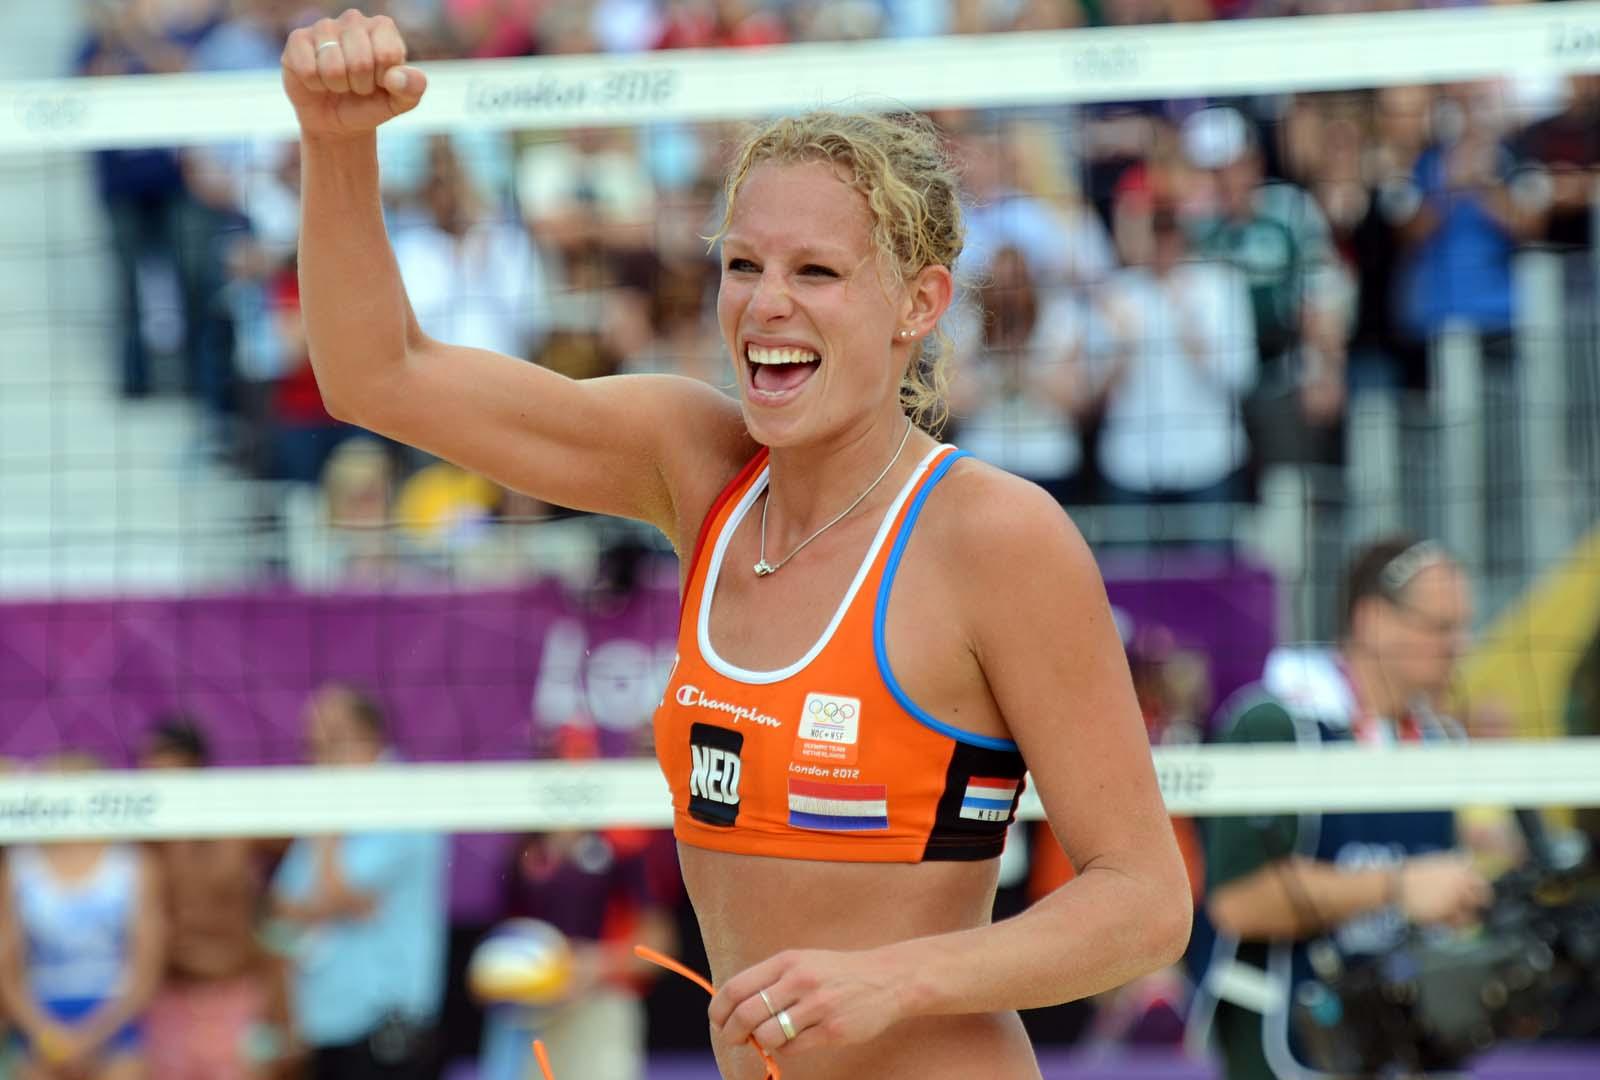 Sanne Keizer from Netherlands